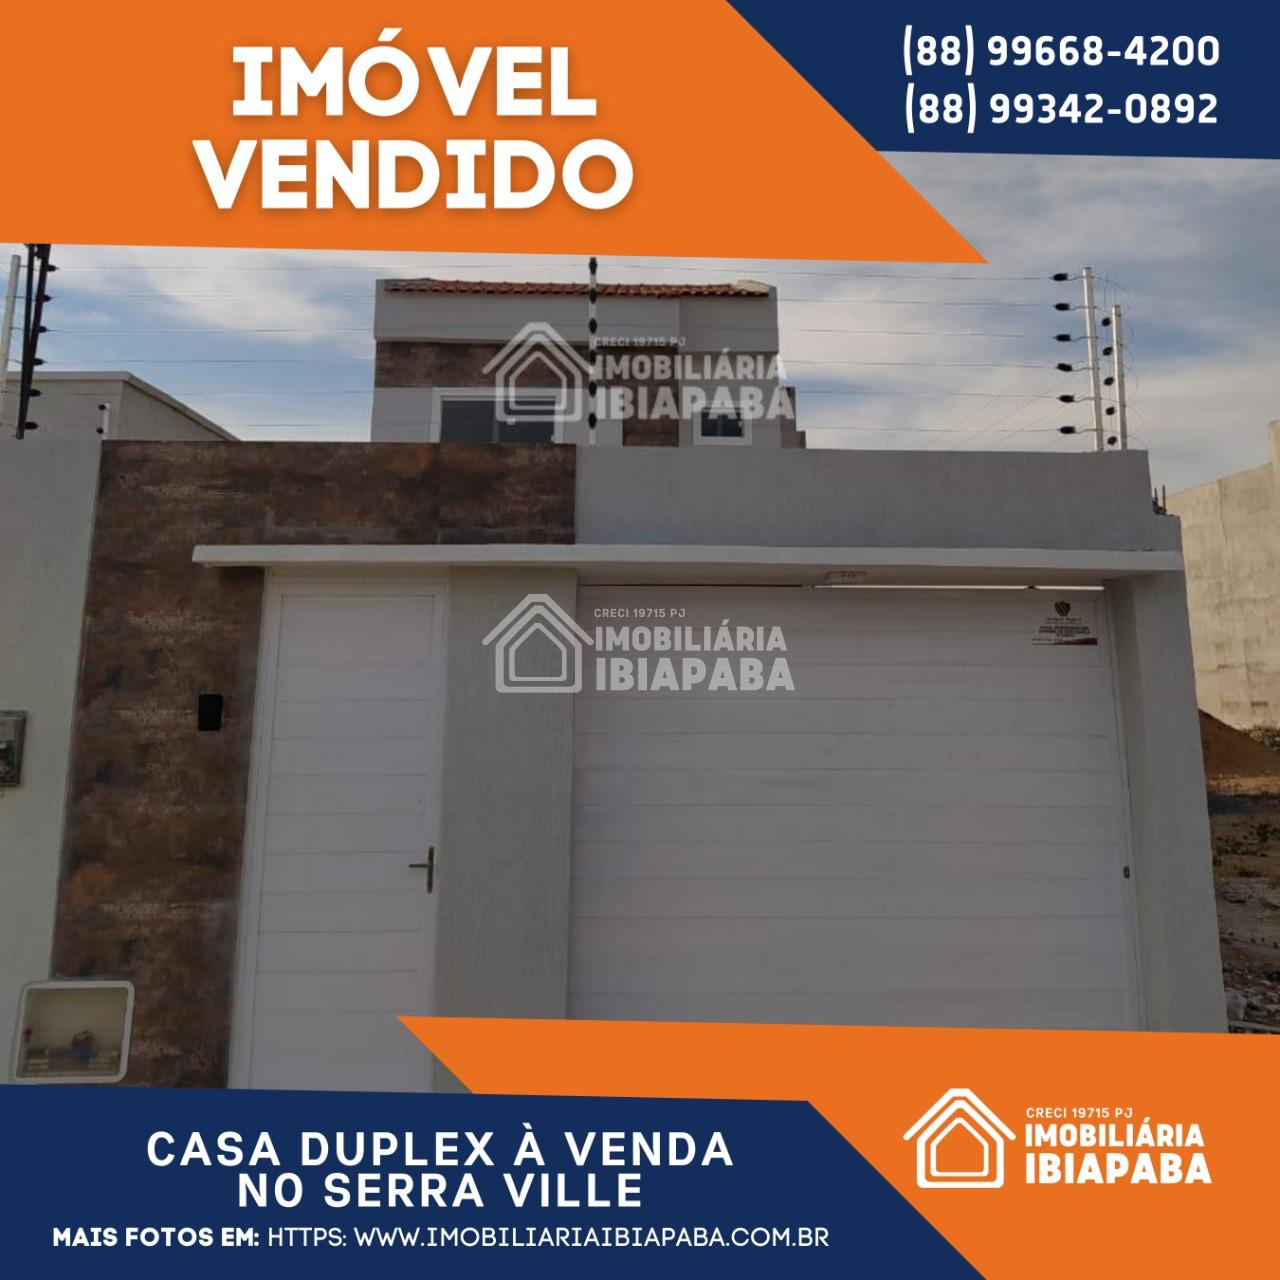 VENDIDO!! CASA DUPLEX NO SERRAVILLE